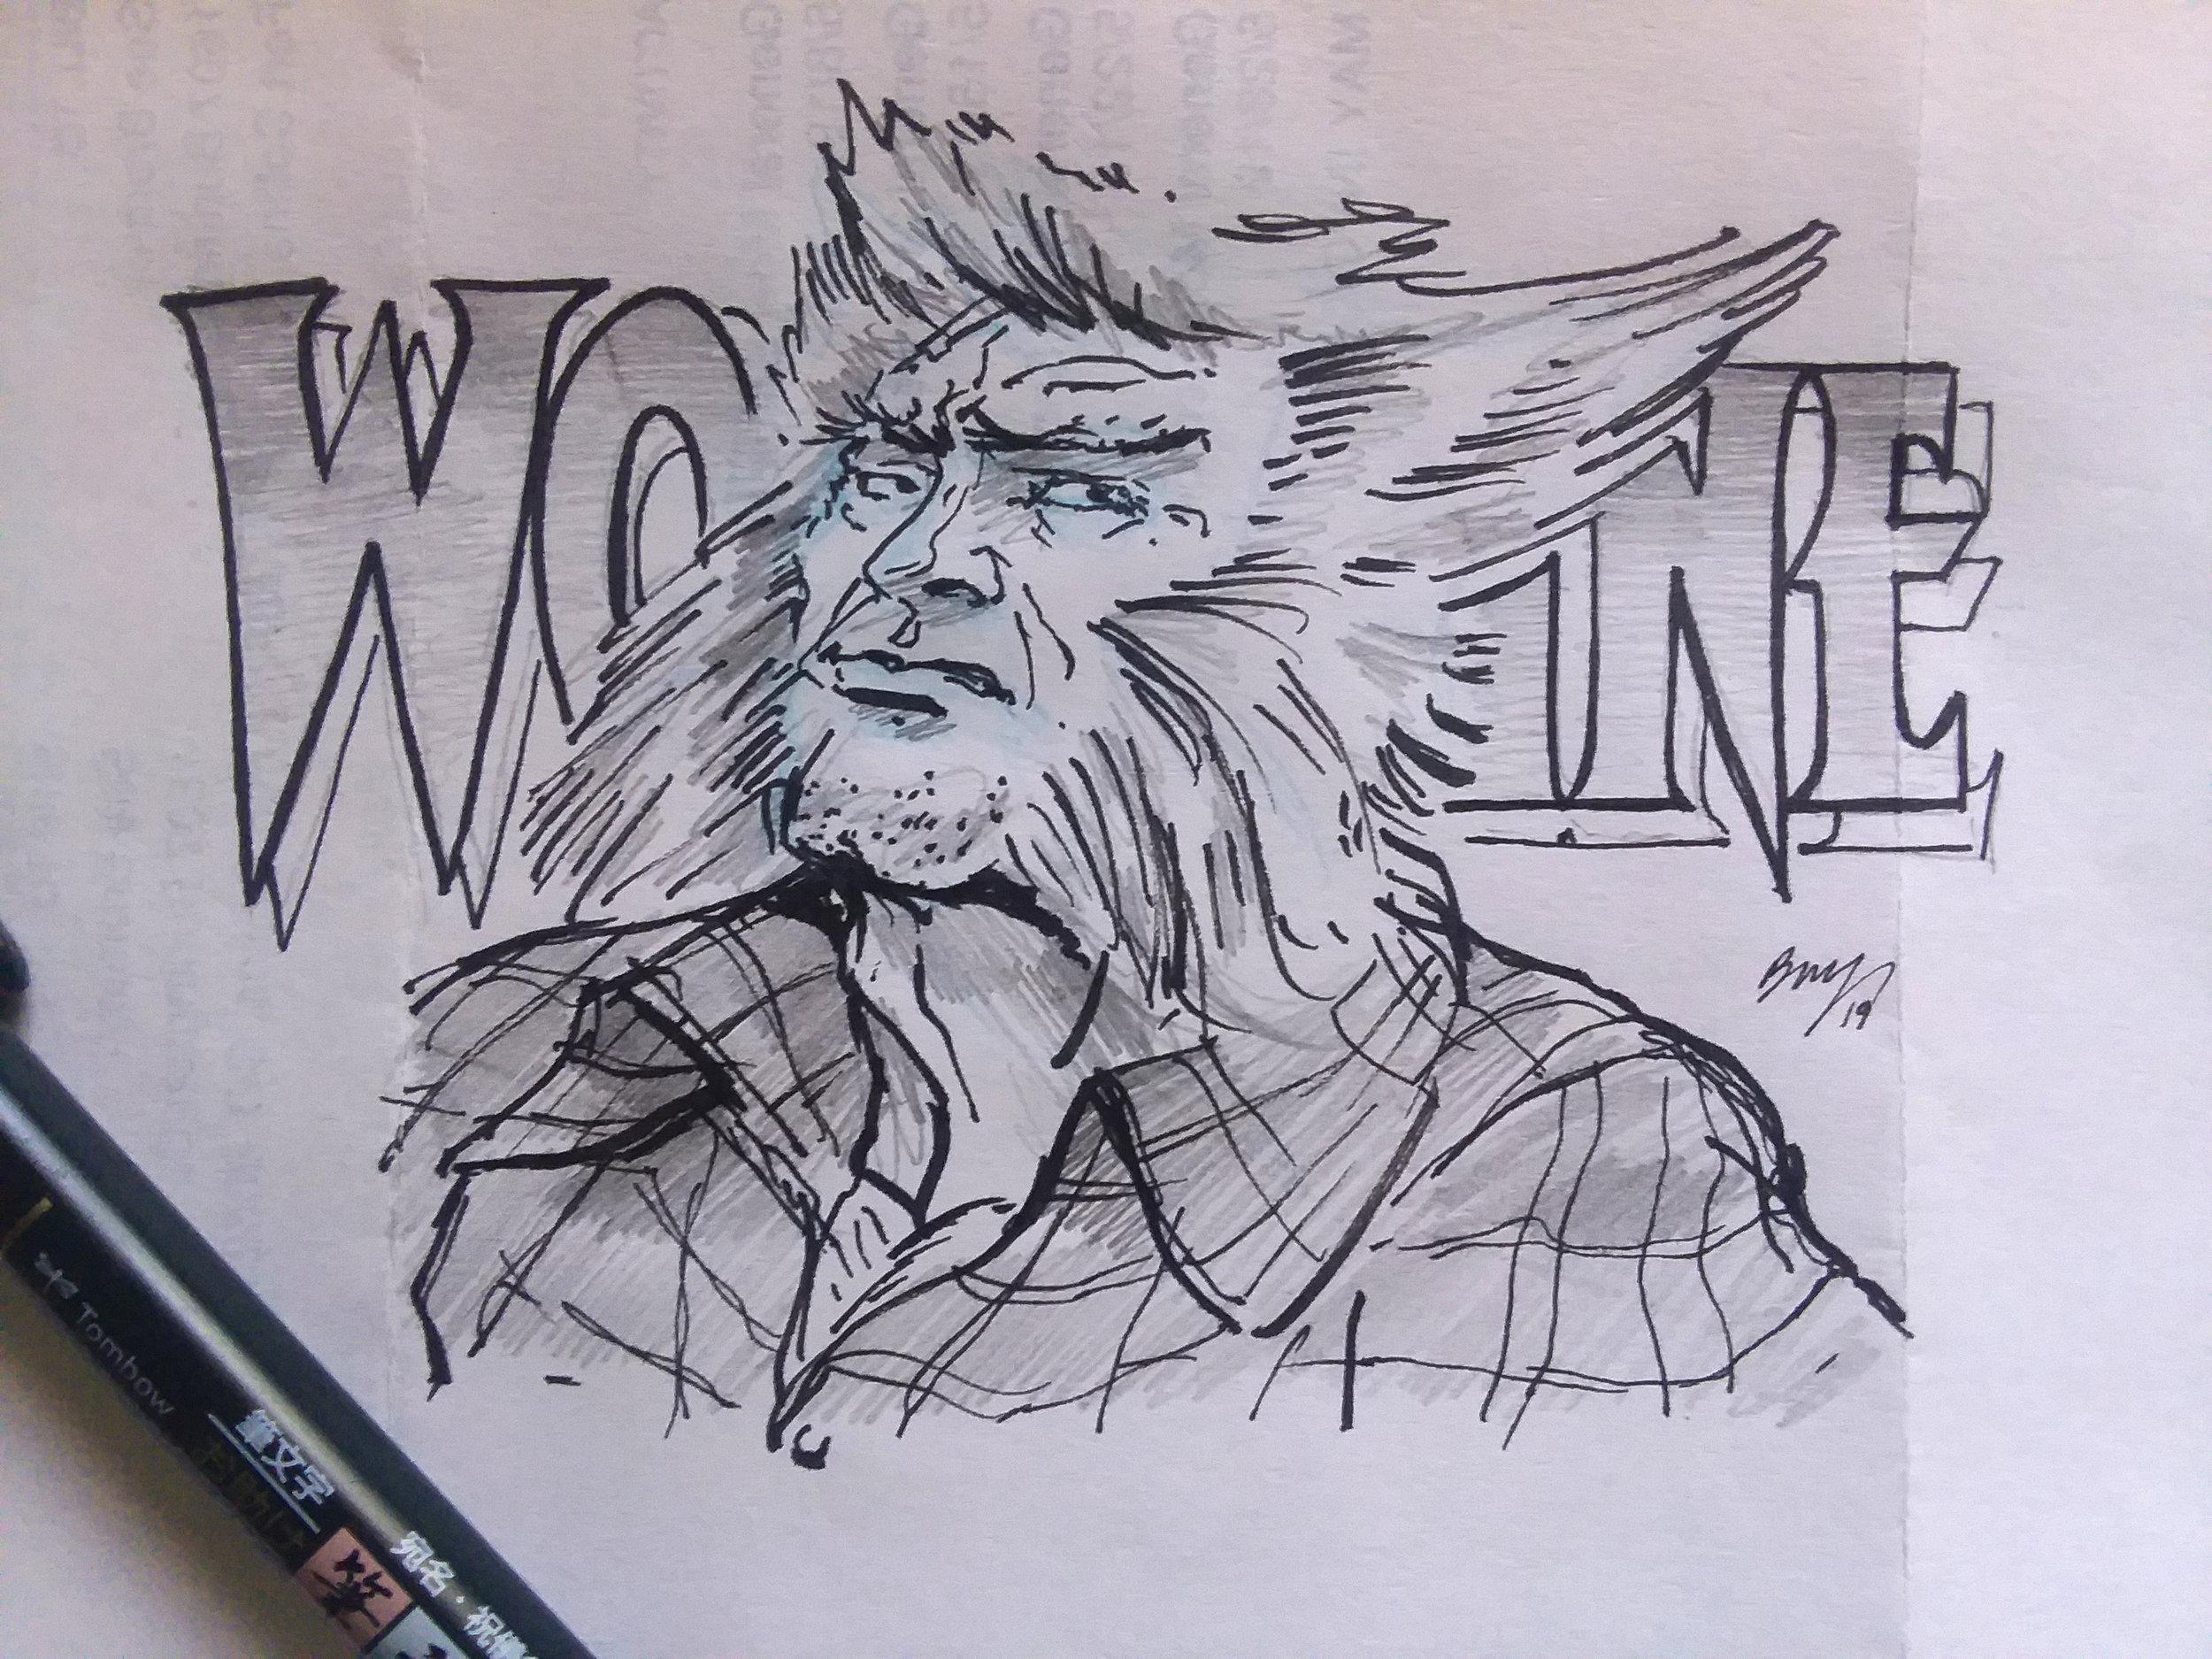 "Wolverine   Paper - Used Typing  Size - 6"" x 4.5""  Medium - HB Pencil ; Tombow Fudenosuke Brush Pen, Hard Tip; Eraser - Kneaded / Stick."